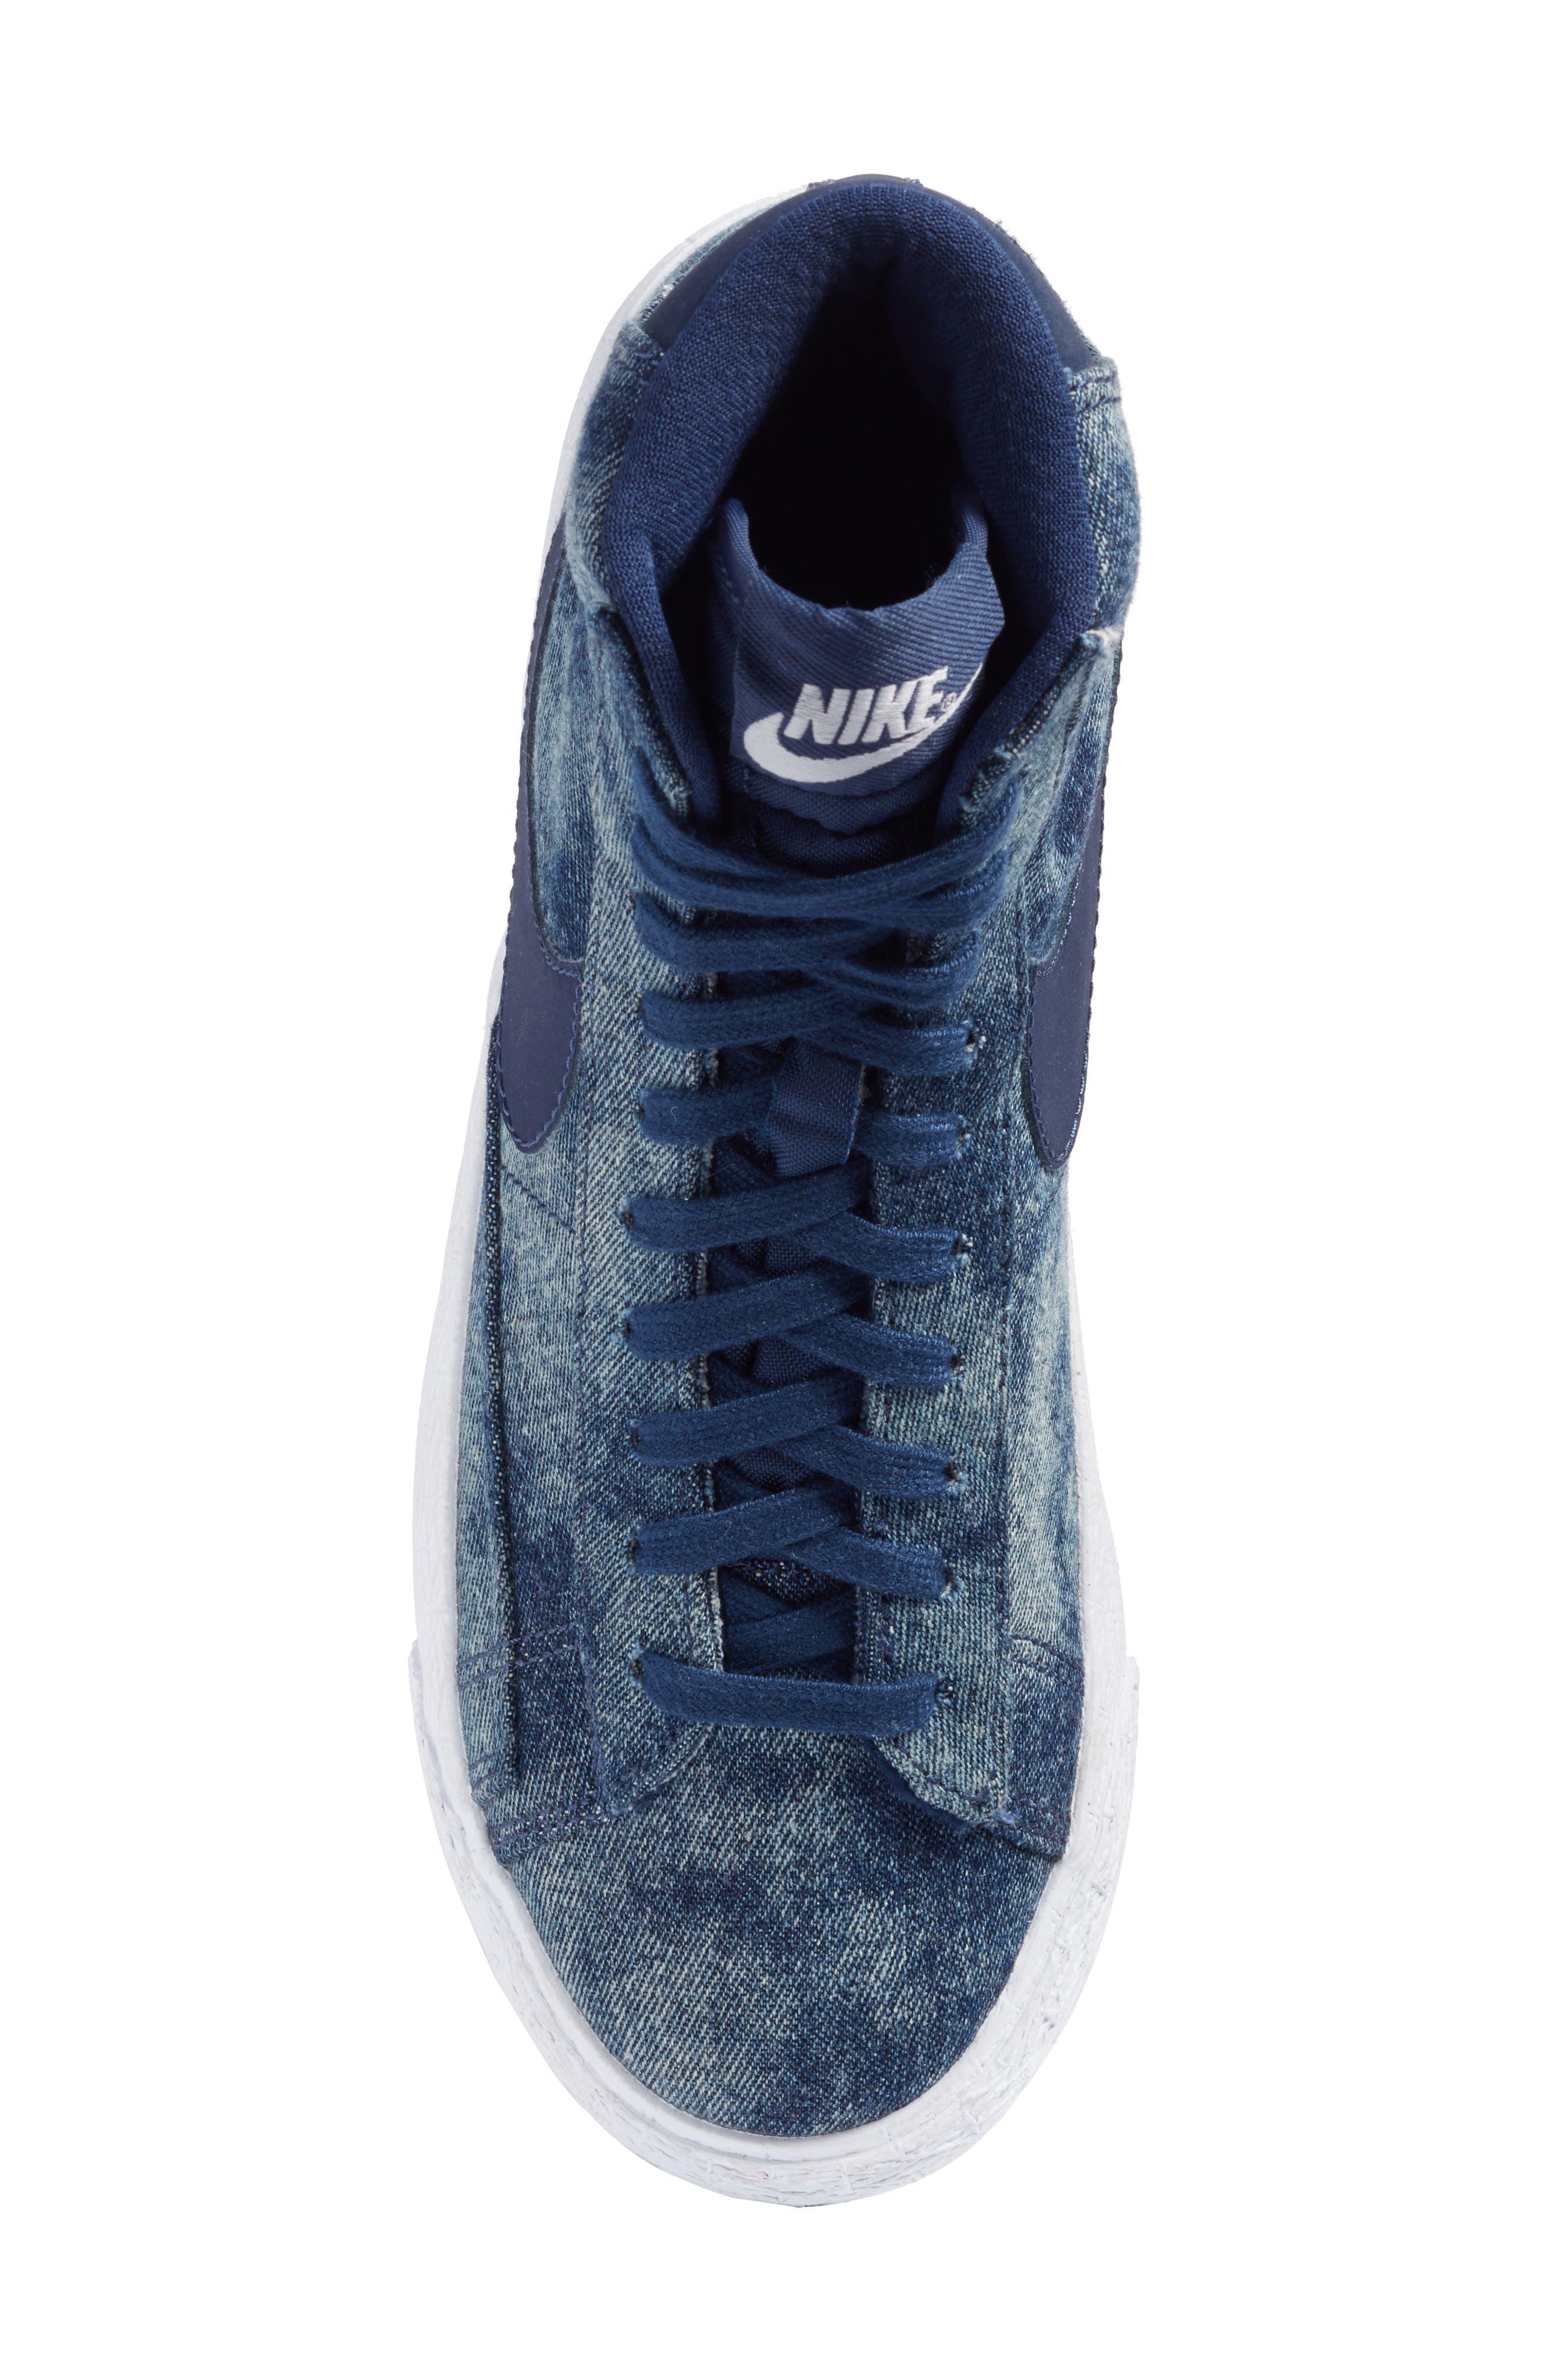 Blazer Mid SE High Top Sneaker,                             Alternate thumbnail 15, color,